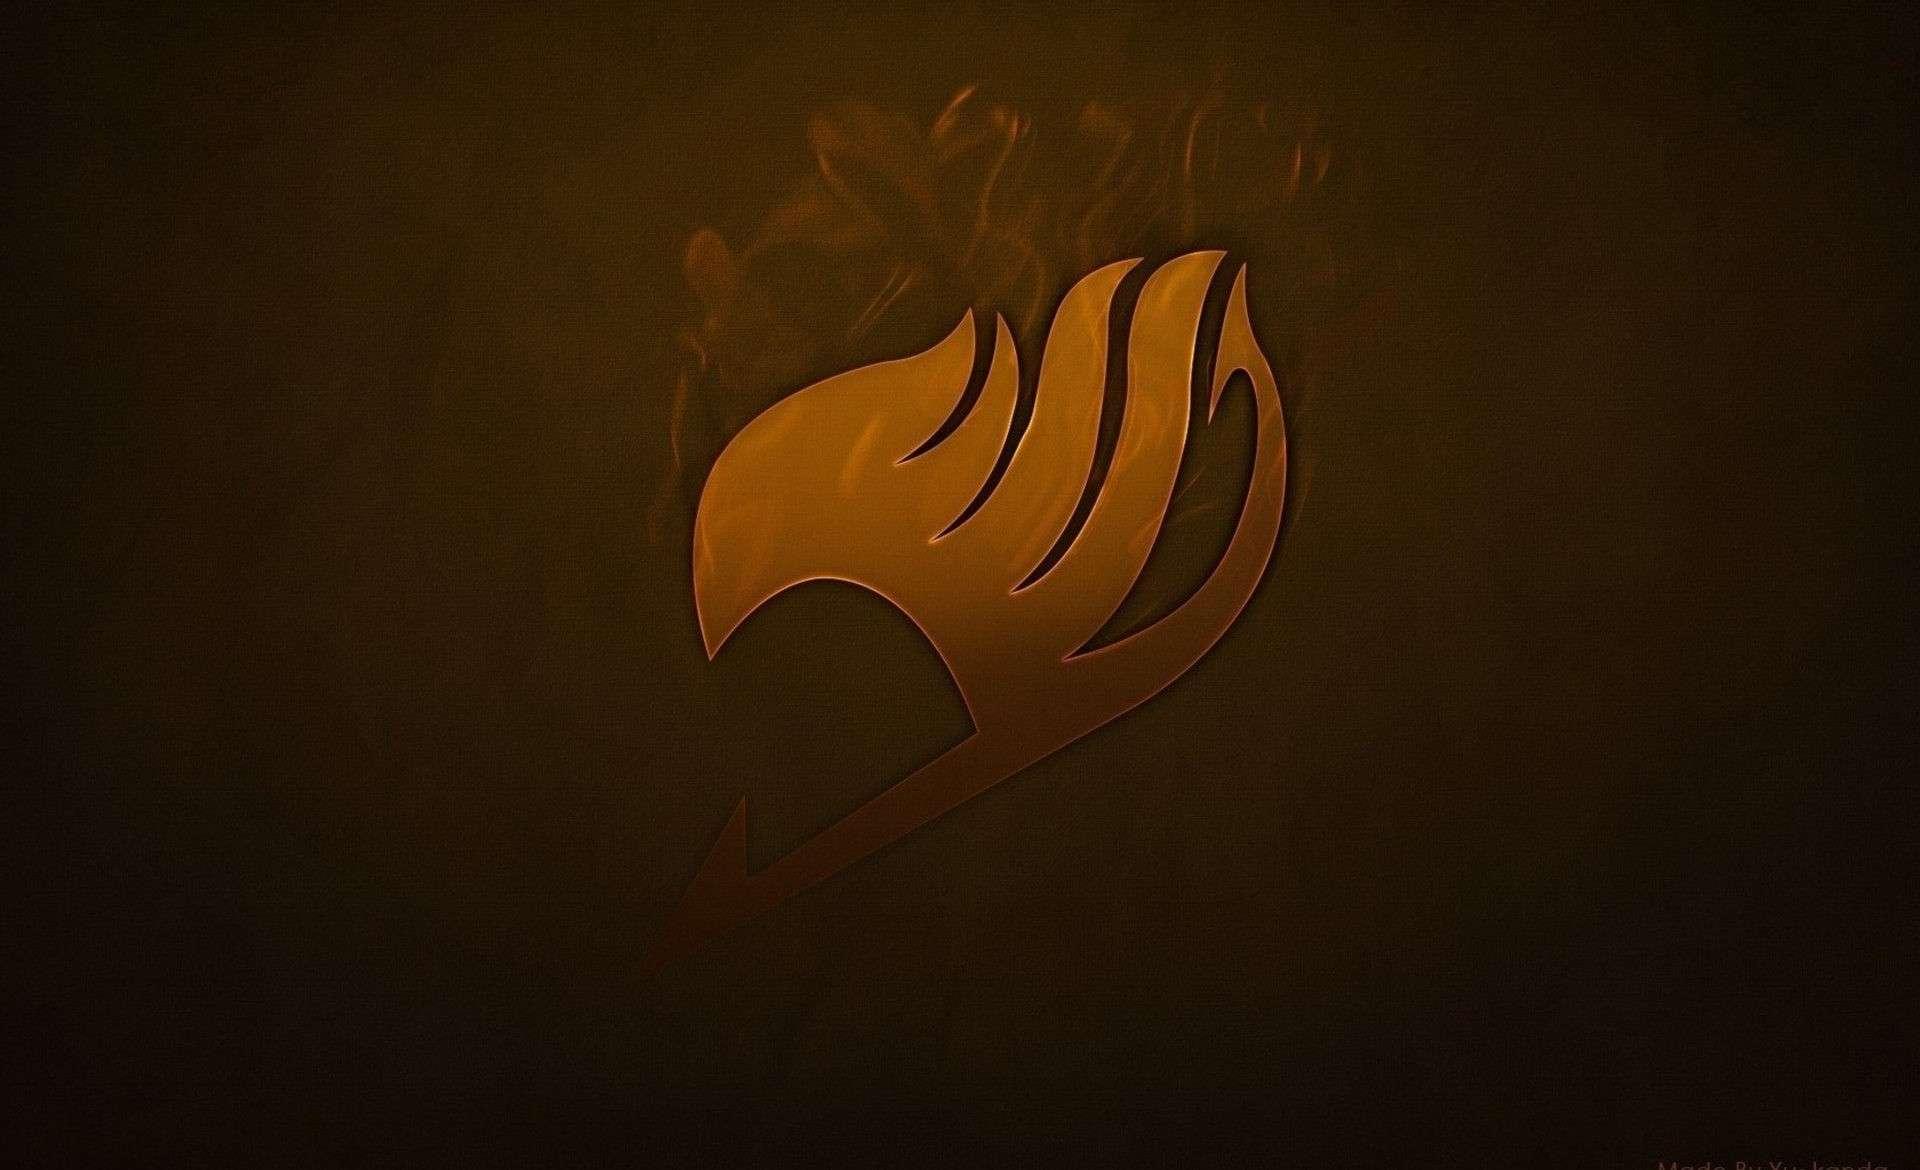 Fairy Tail Logo Wallpaper 001